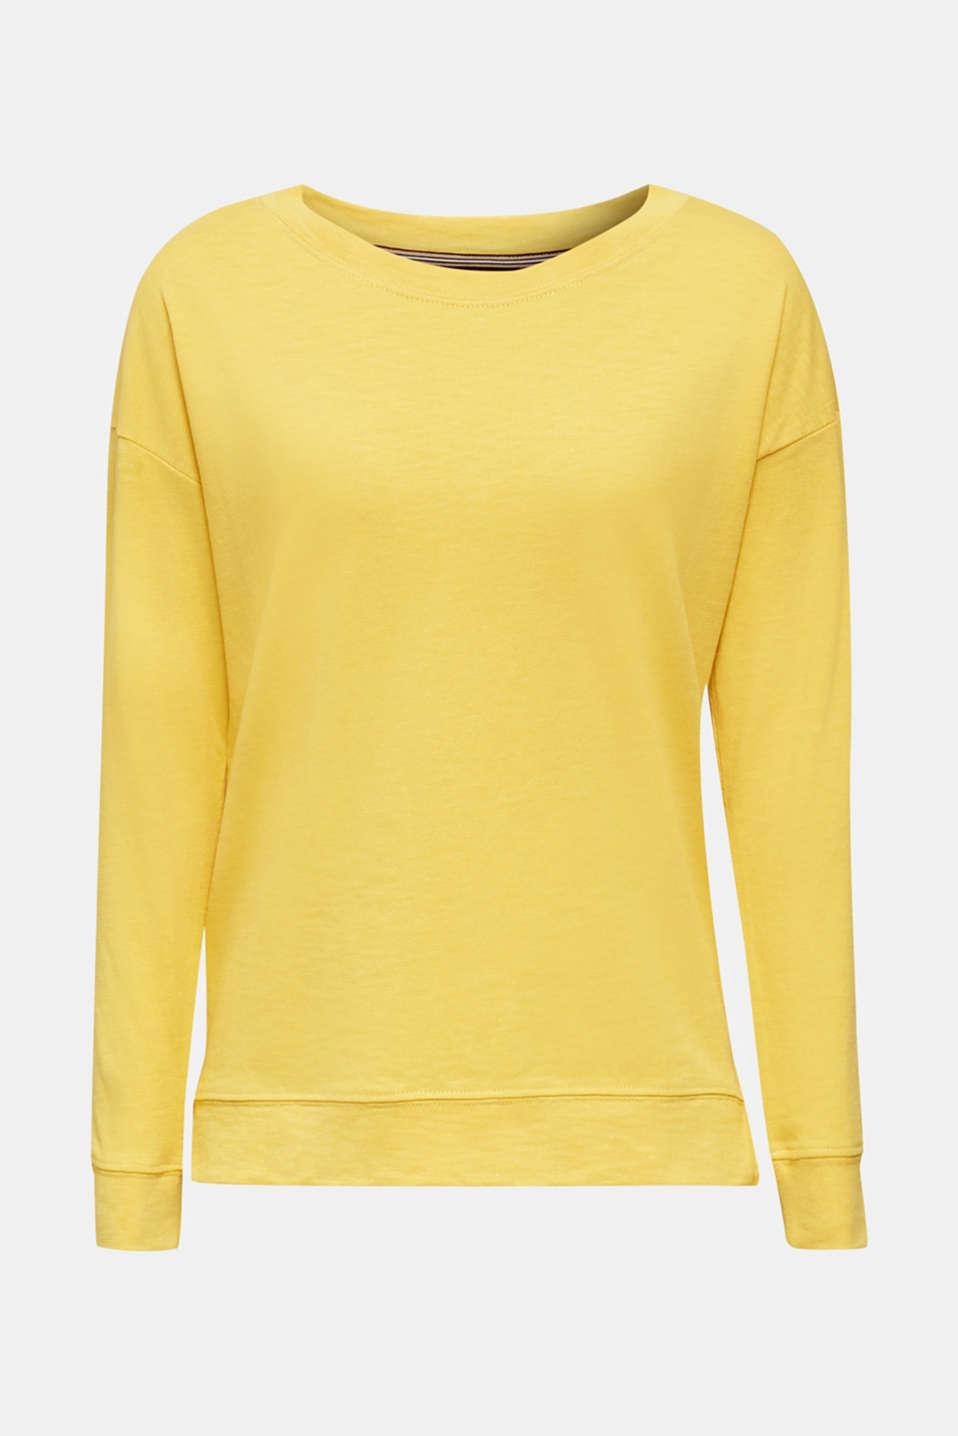 Slub sweatshirt made of 100% organic cotton, YELLOW, detail image number 7